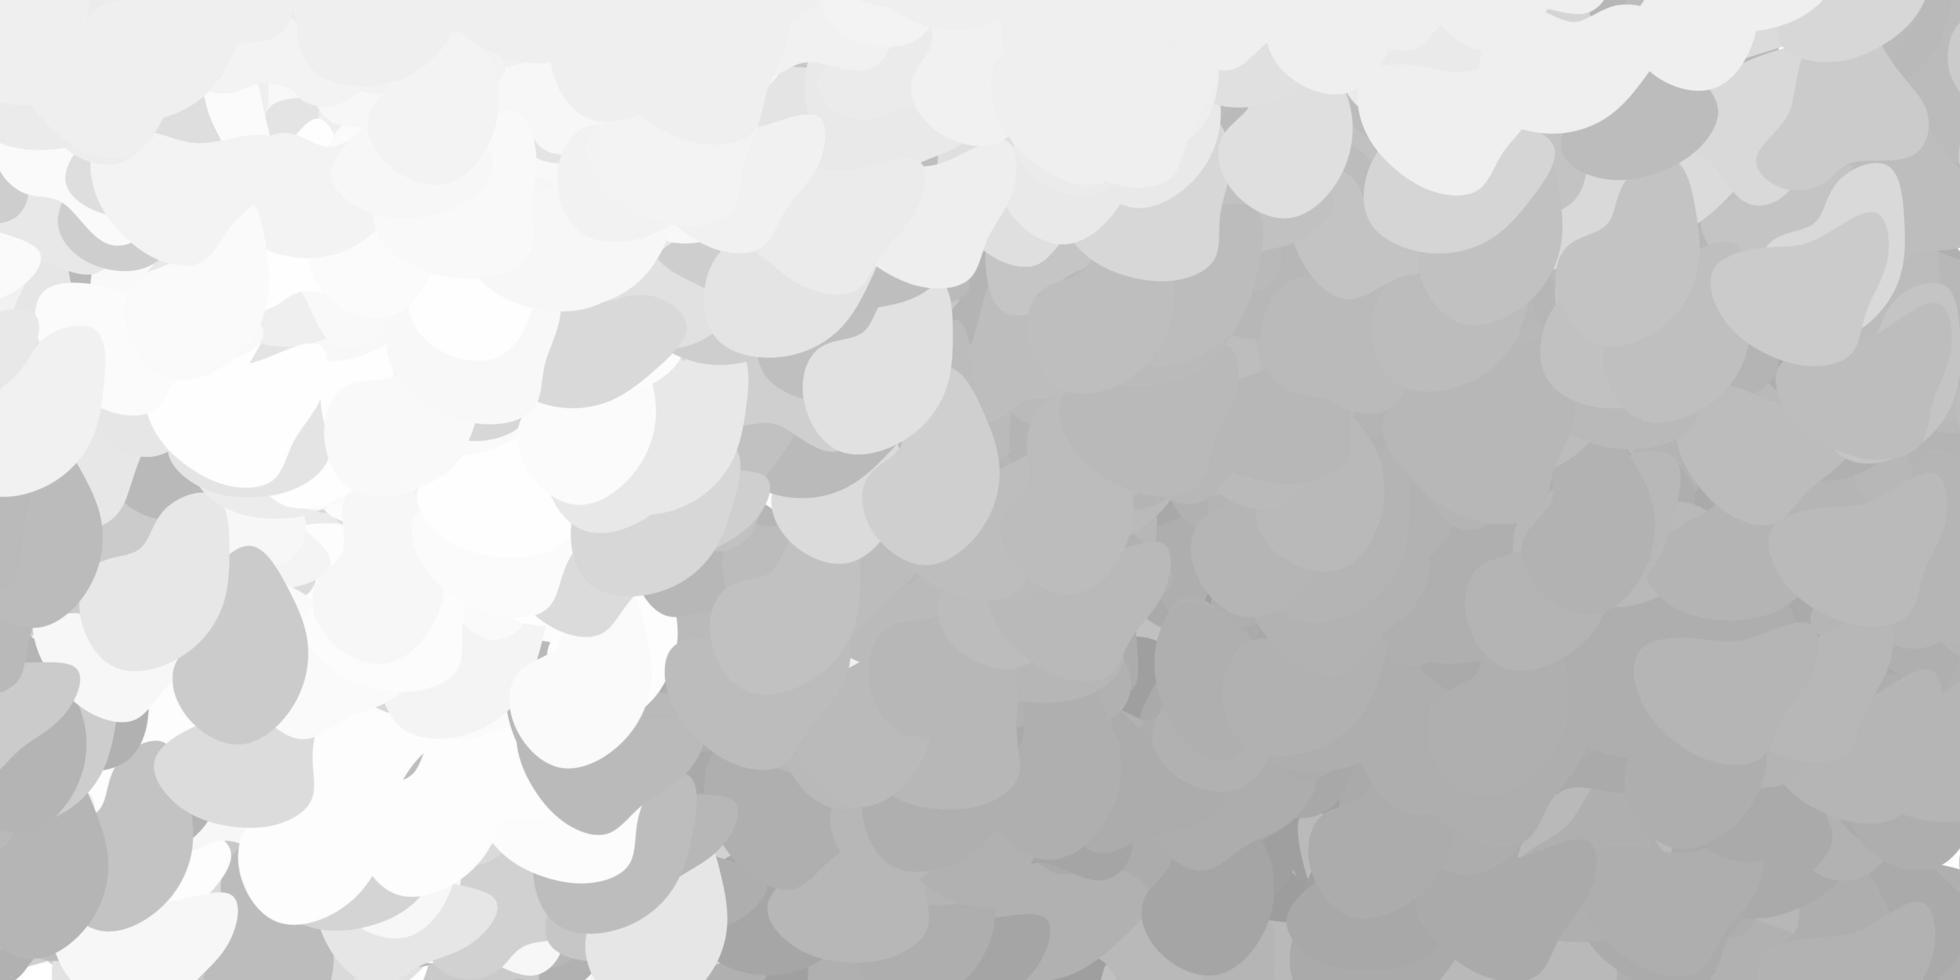 dunkelgraues Vektormuster mit abstrakten Formen. vektor